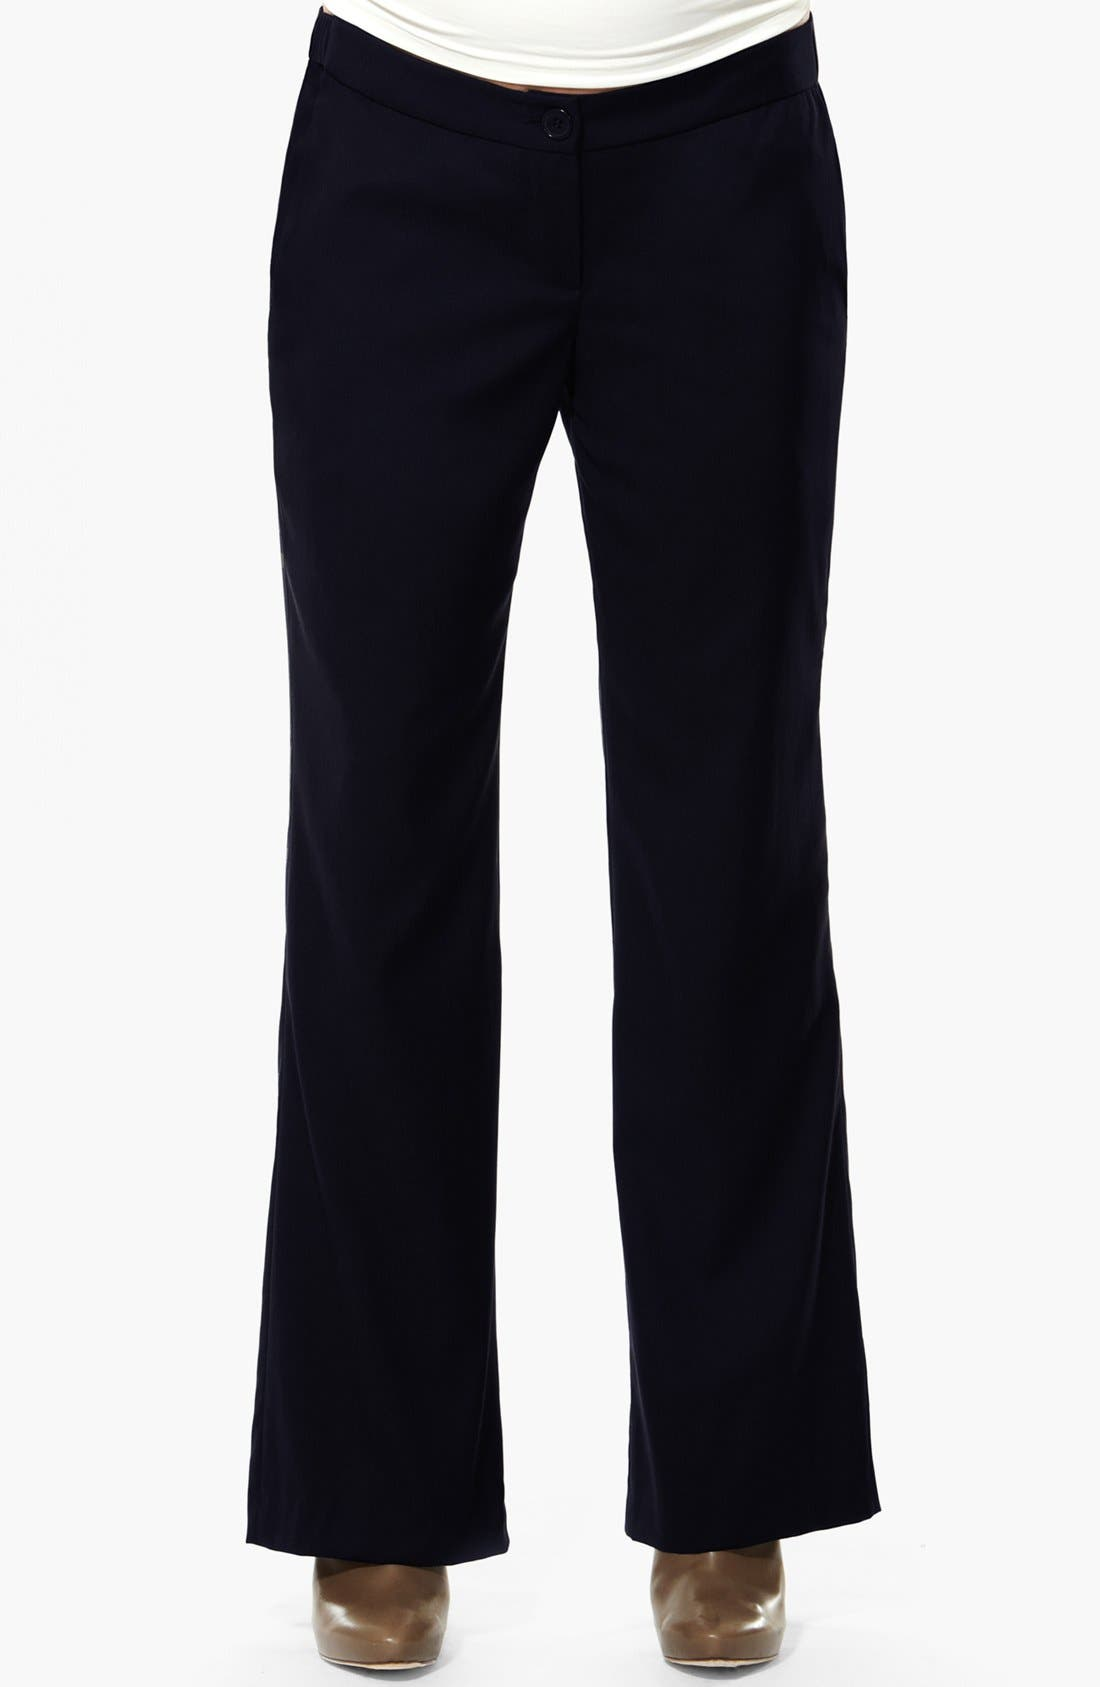 Eva Alexander London 'Morgan' Tailored Maternity Pants